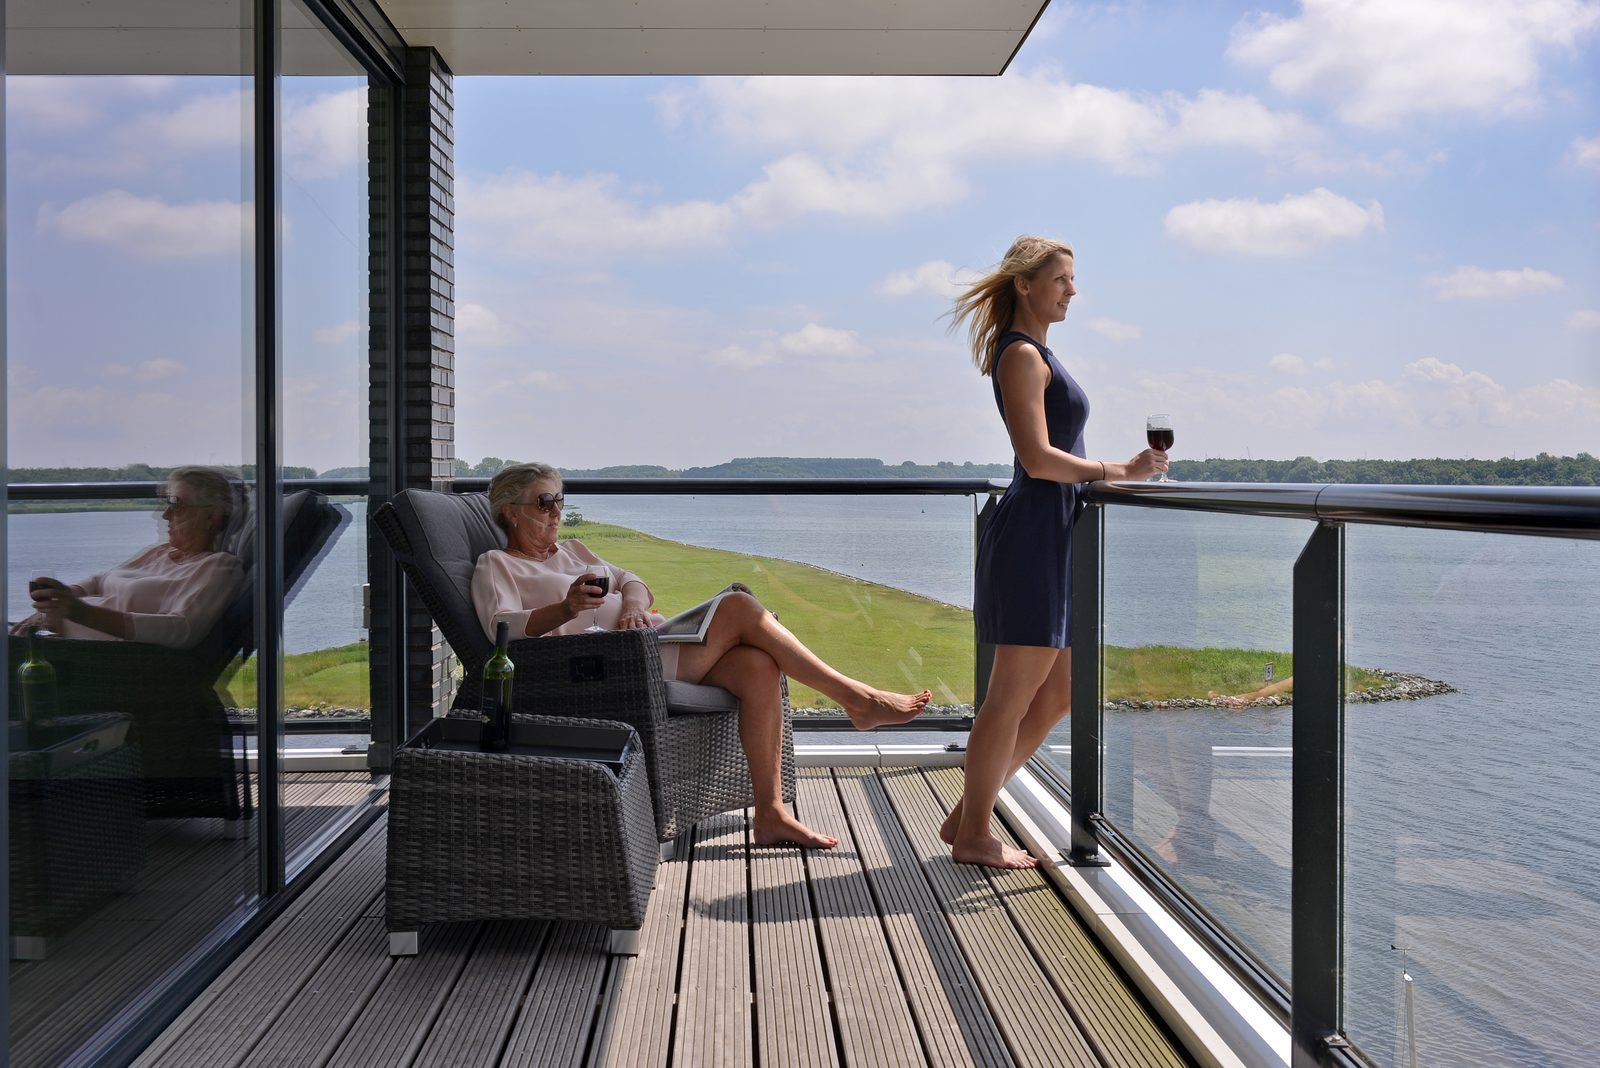 Luxury apartments in Zeeland along the Veerse meer